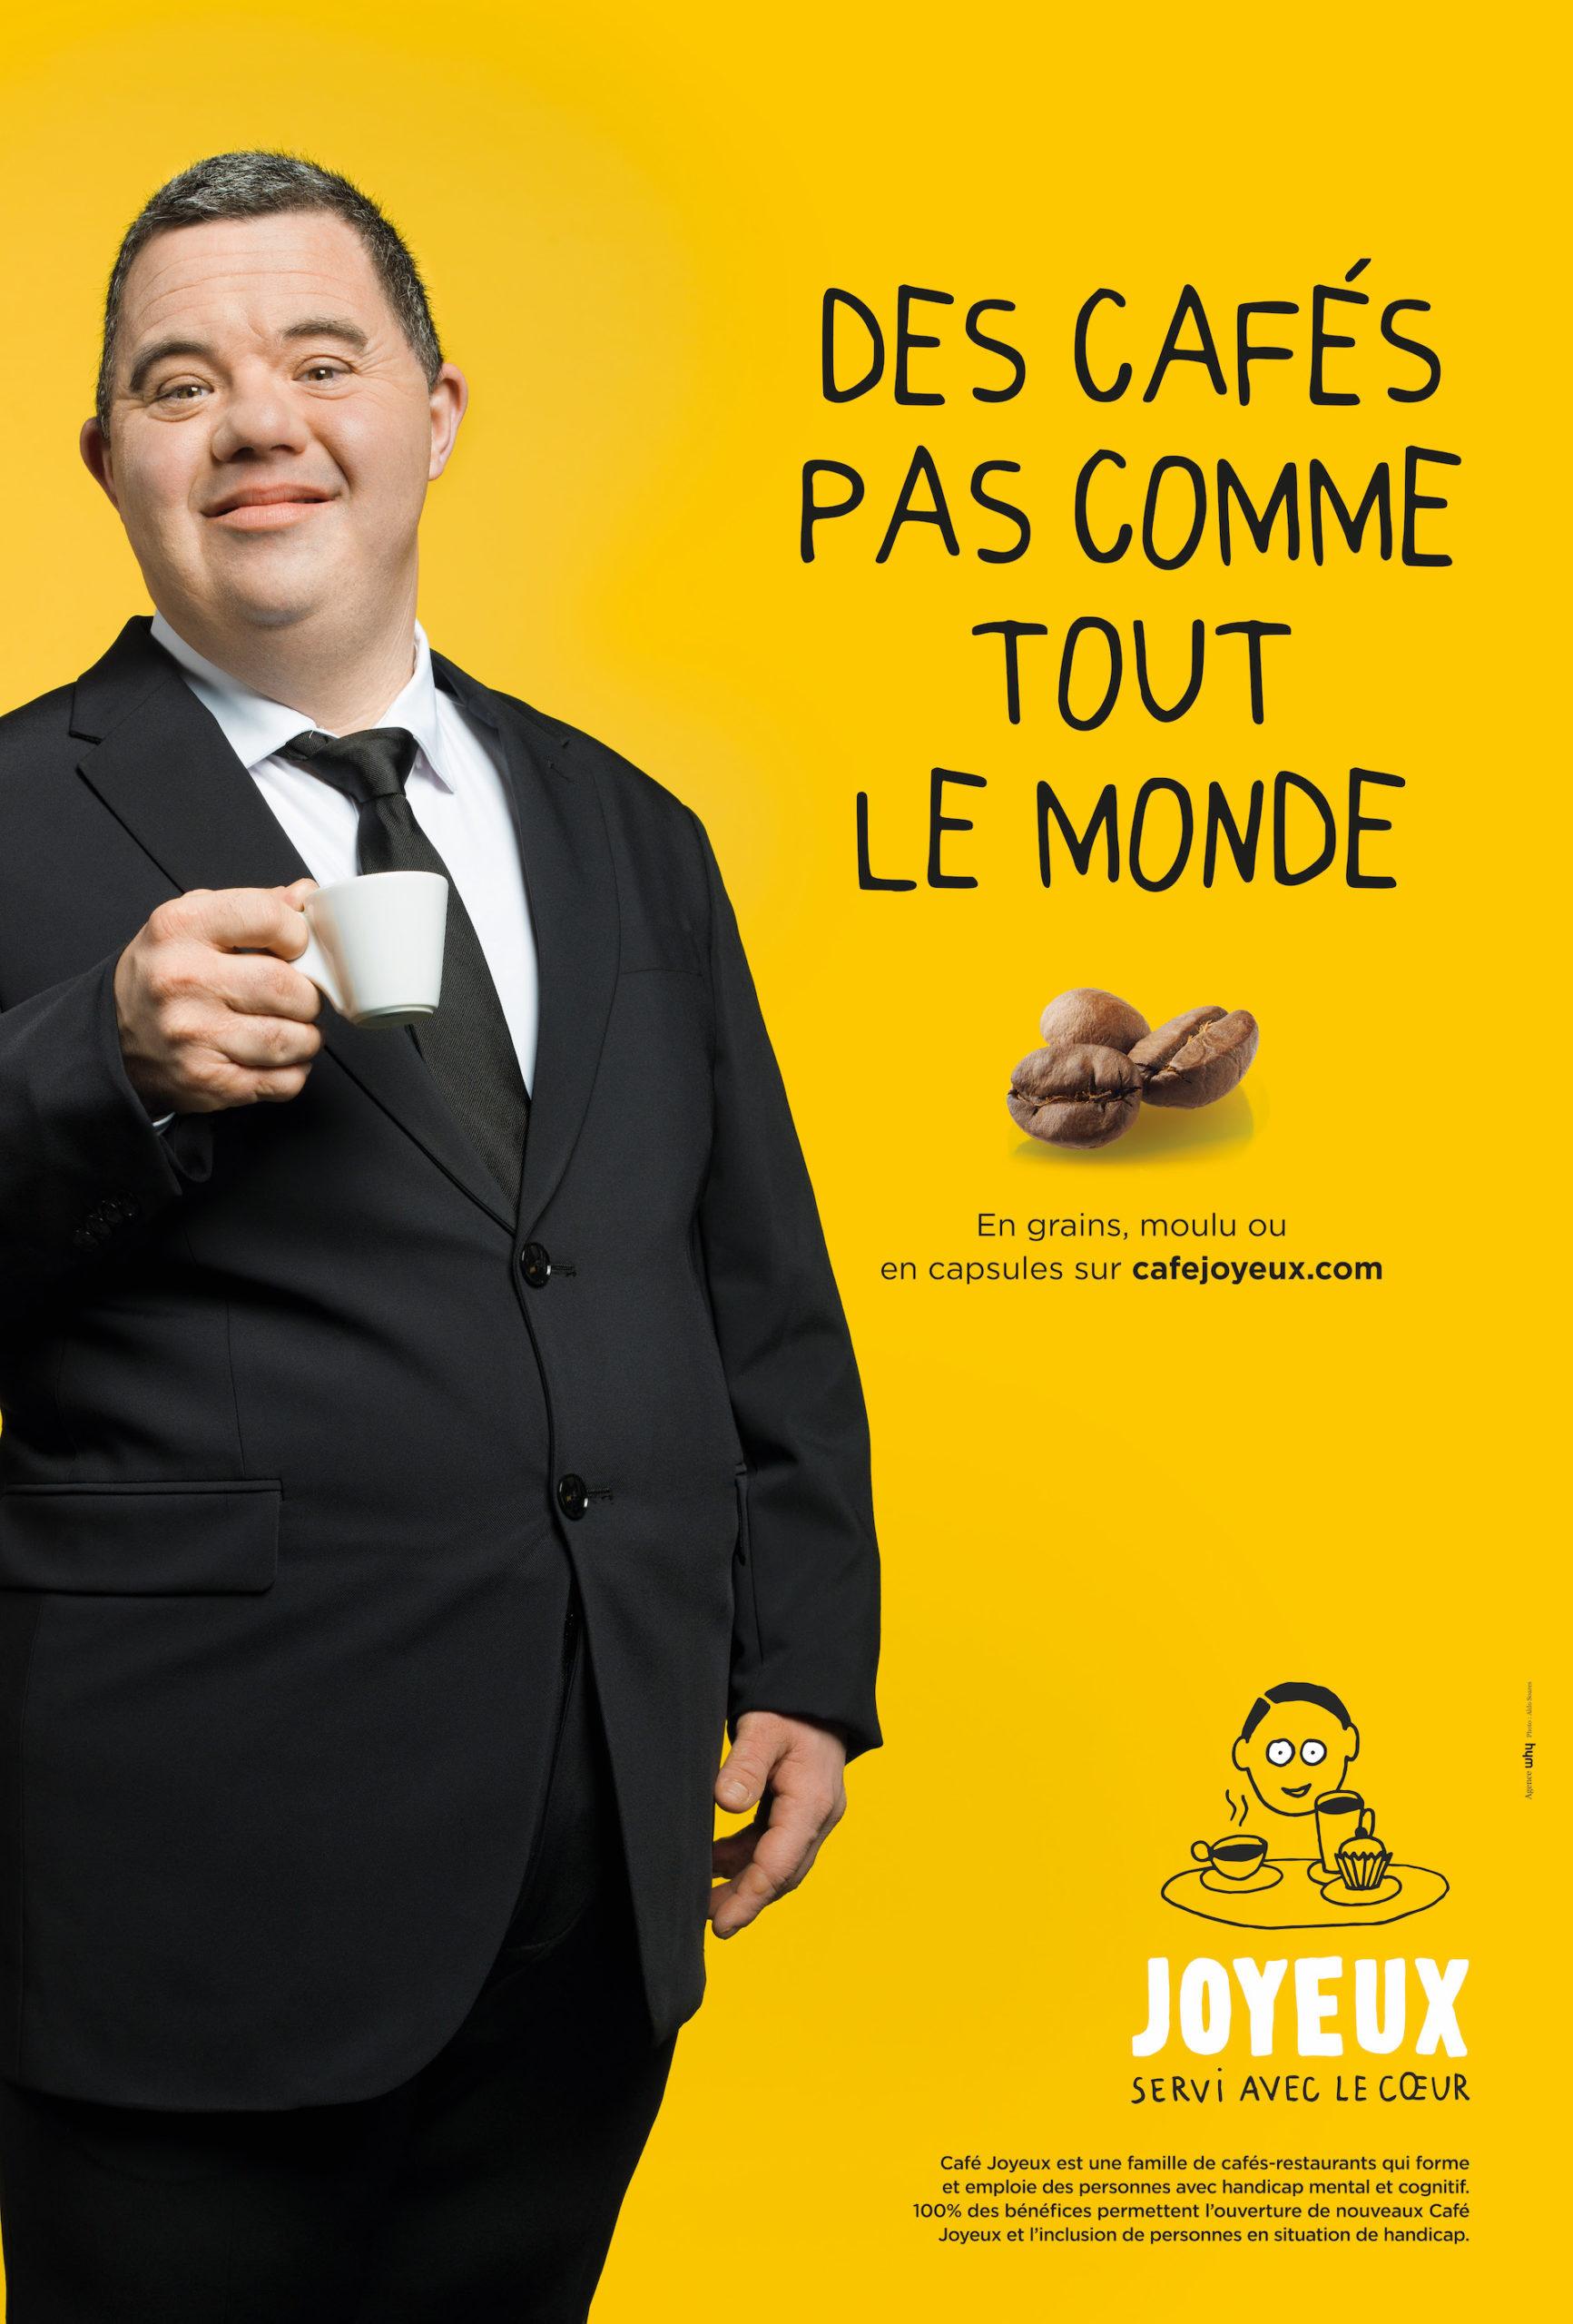 CAFEJOYEUX_AFFICHES_CAFES_2m2_FEV_2020_2